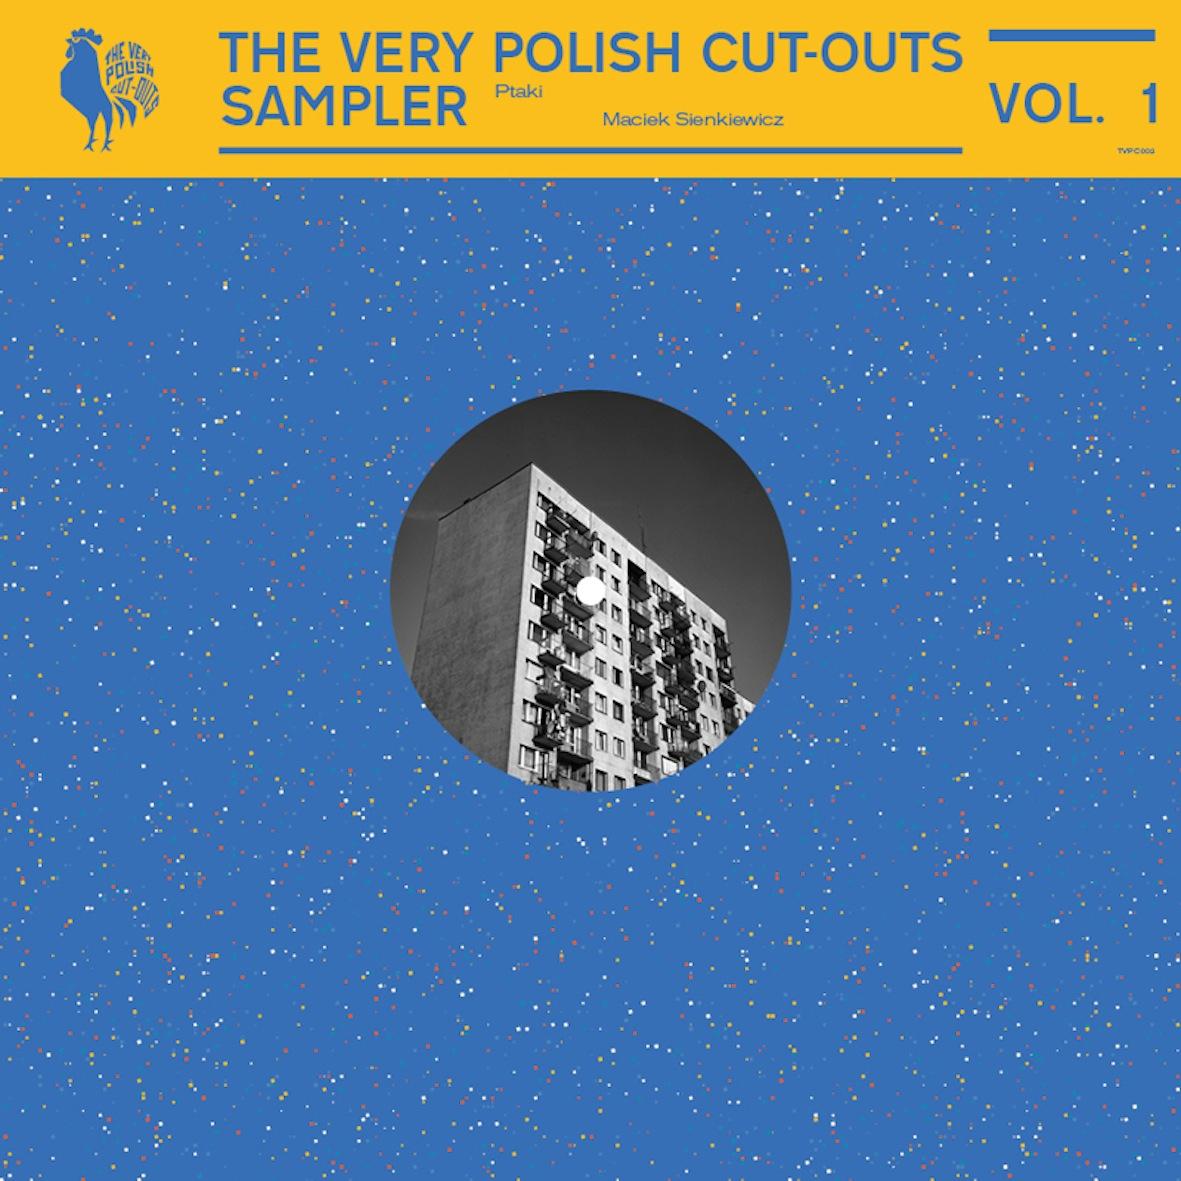 Test Pressing, Reviews, Promo`d, Dr Rob, Very Polish Cut Outs, Ptaki, Krystyna, Maciek Seinkiewicz